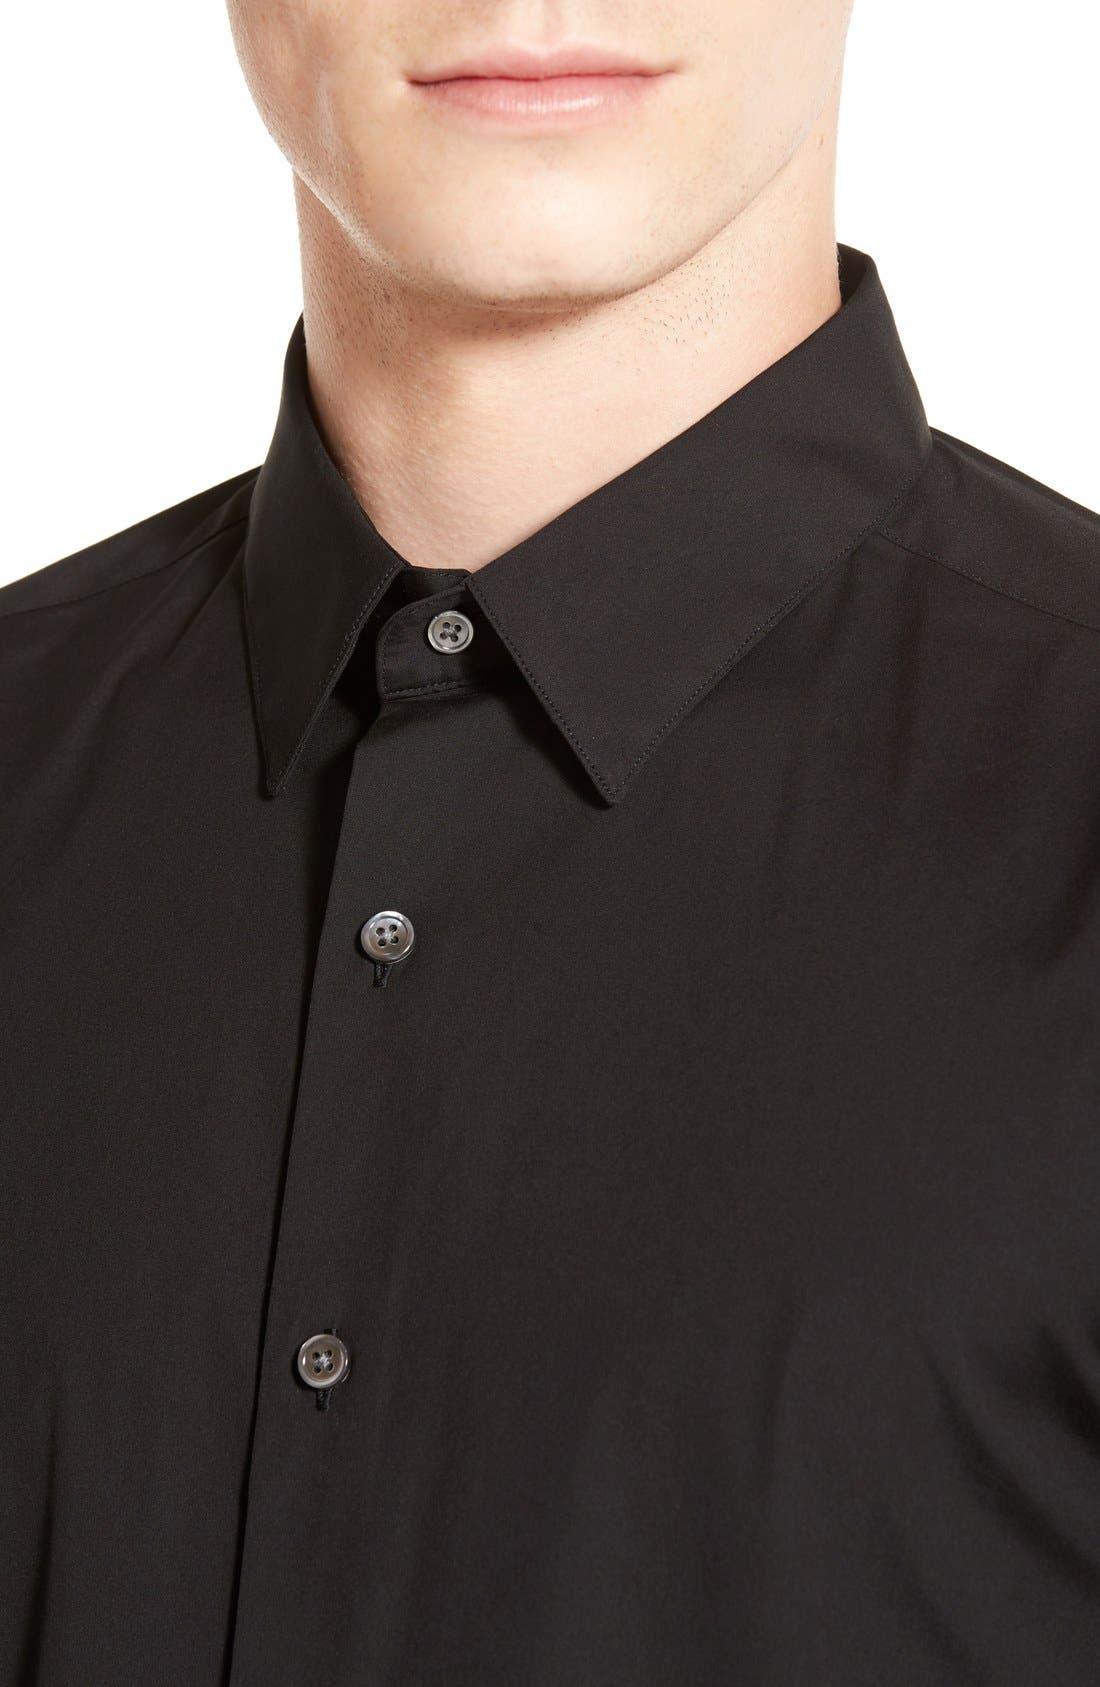 'Sylvain' Trim Fit Long Sleeve Sport Shirt,                             Alternate thumbnail 6, color,                             BLACK